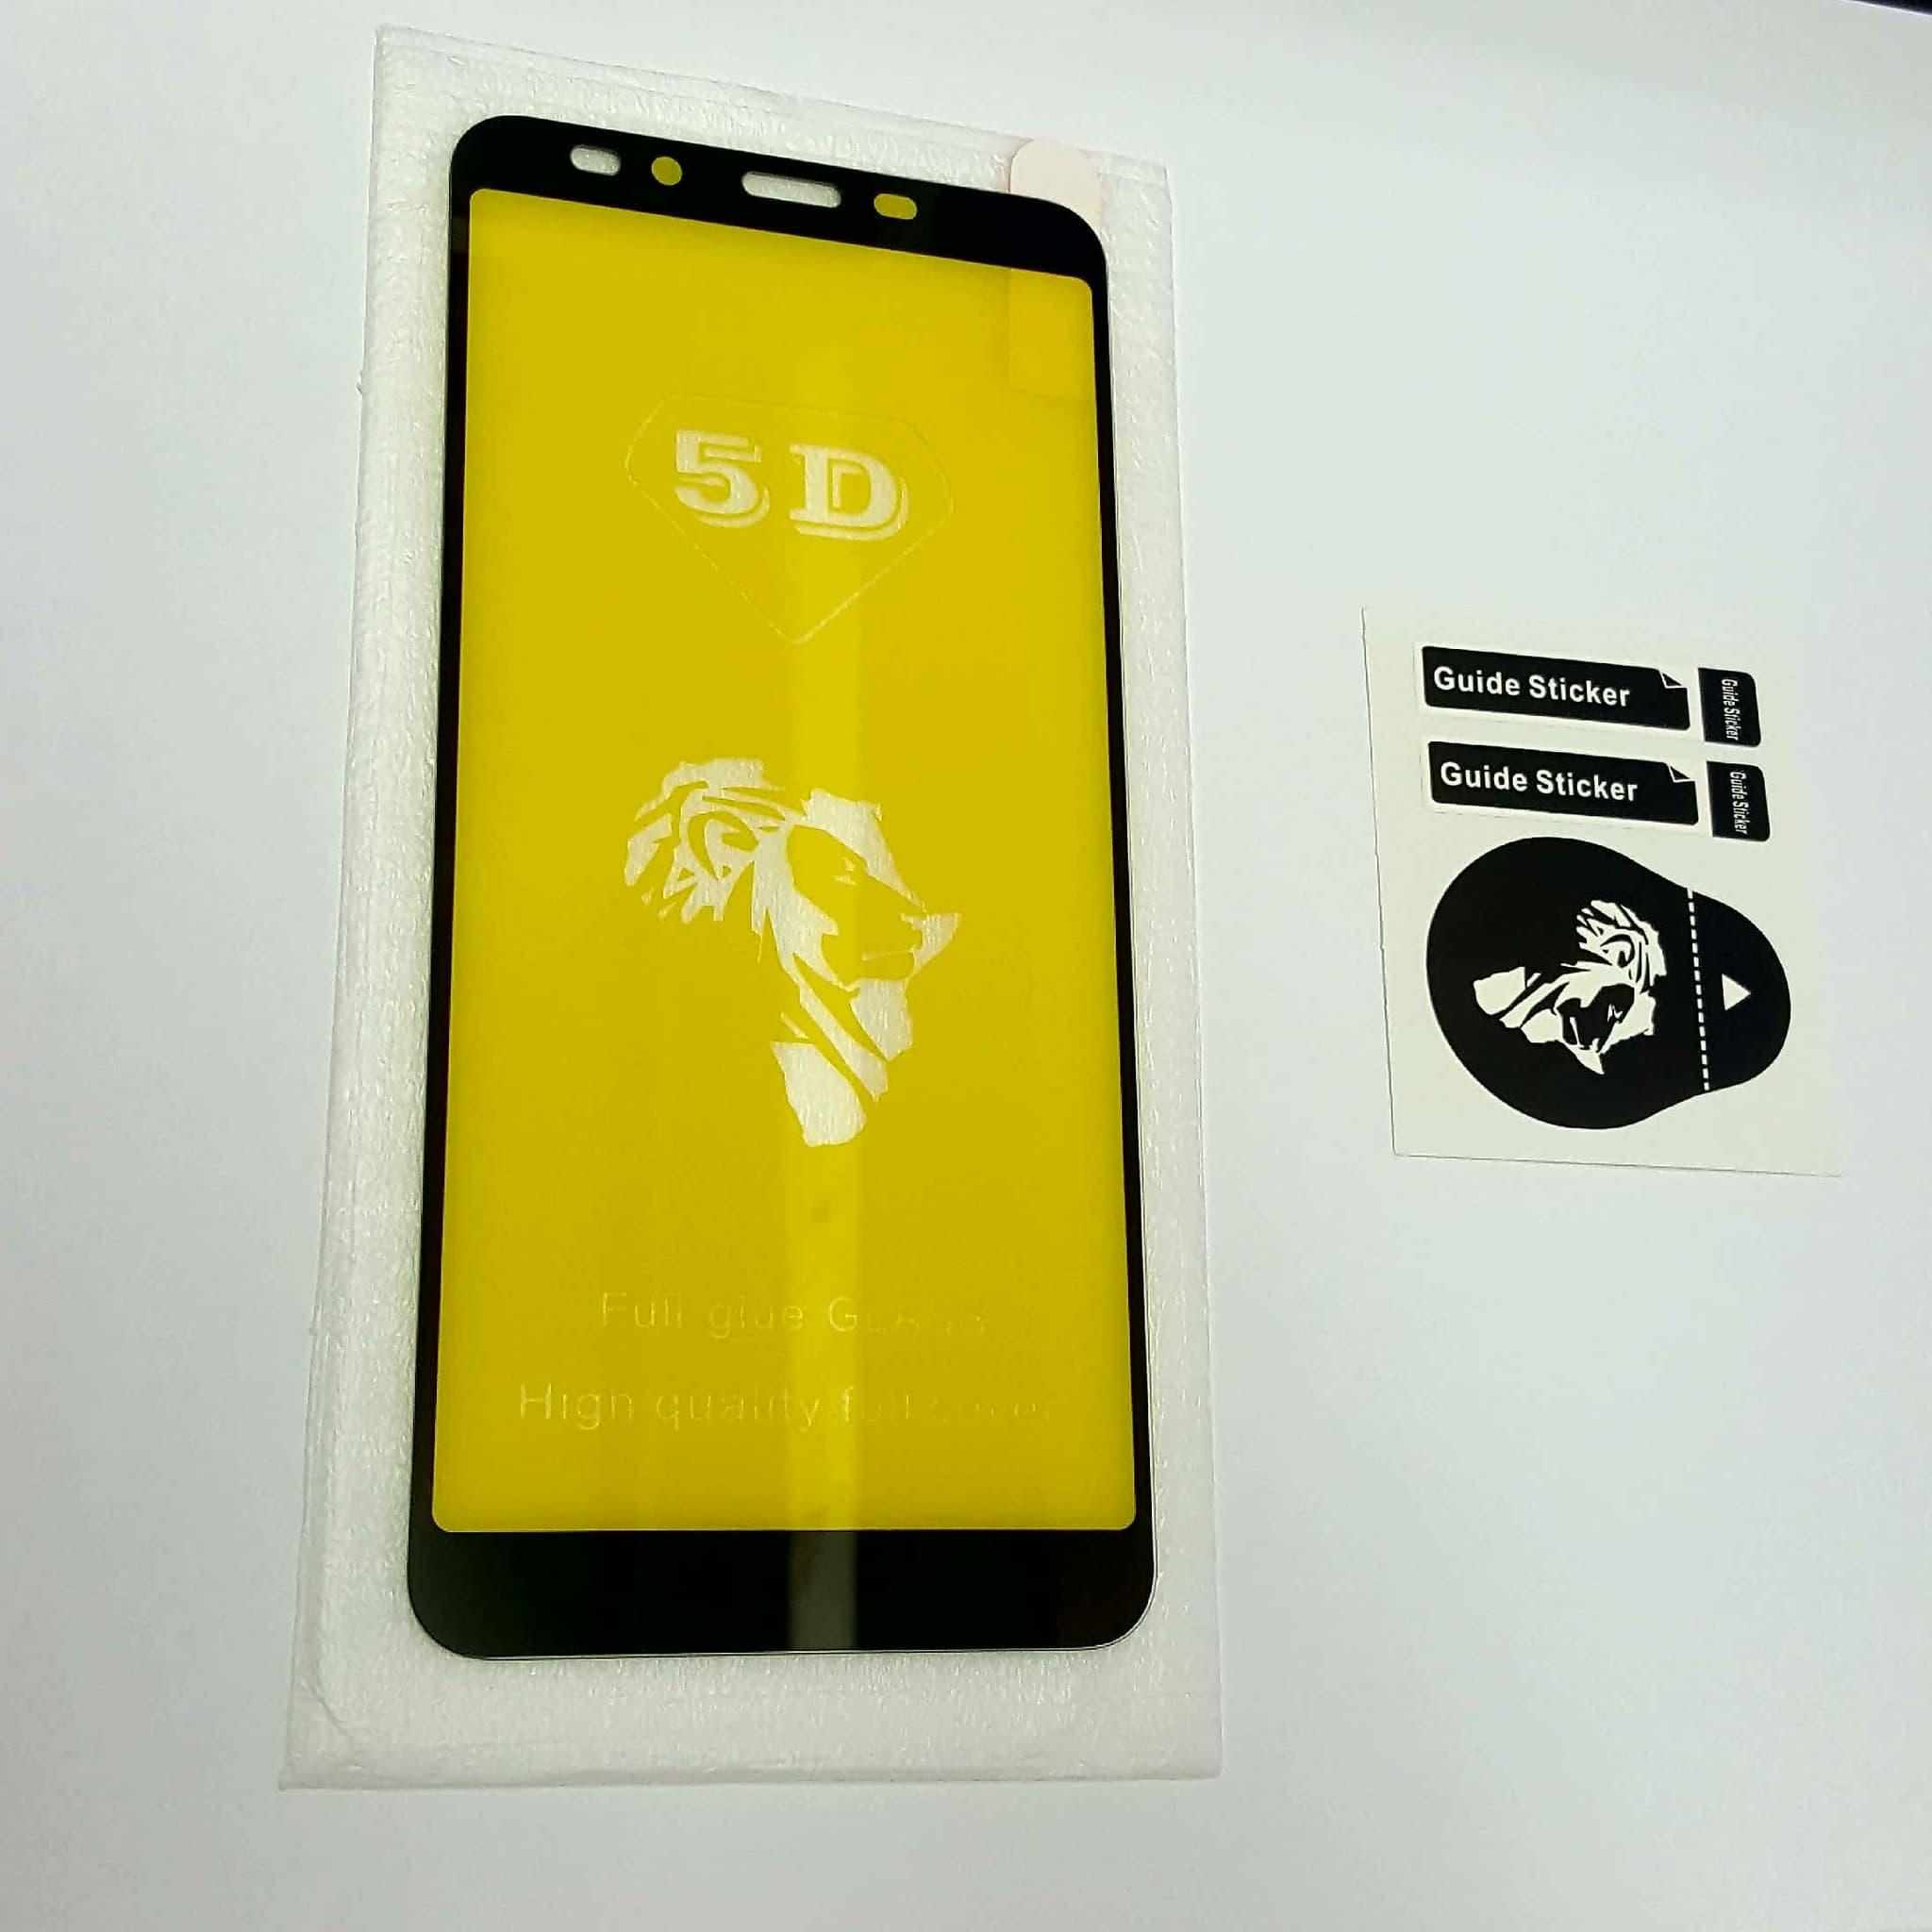 Jual Tempered Glass Infinix Smart 2 X5515f 5d Full Cameron Zero 3 X552 Antigores Cover Hitam